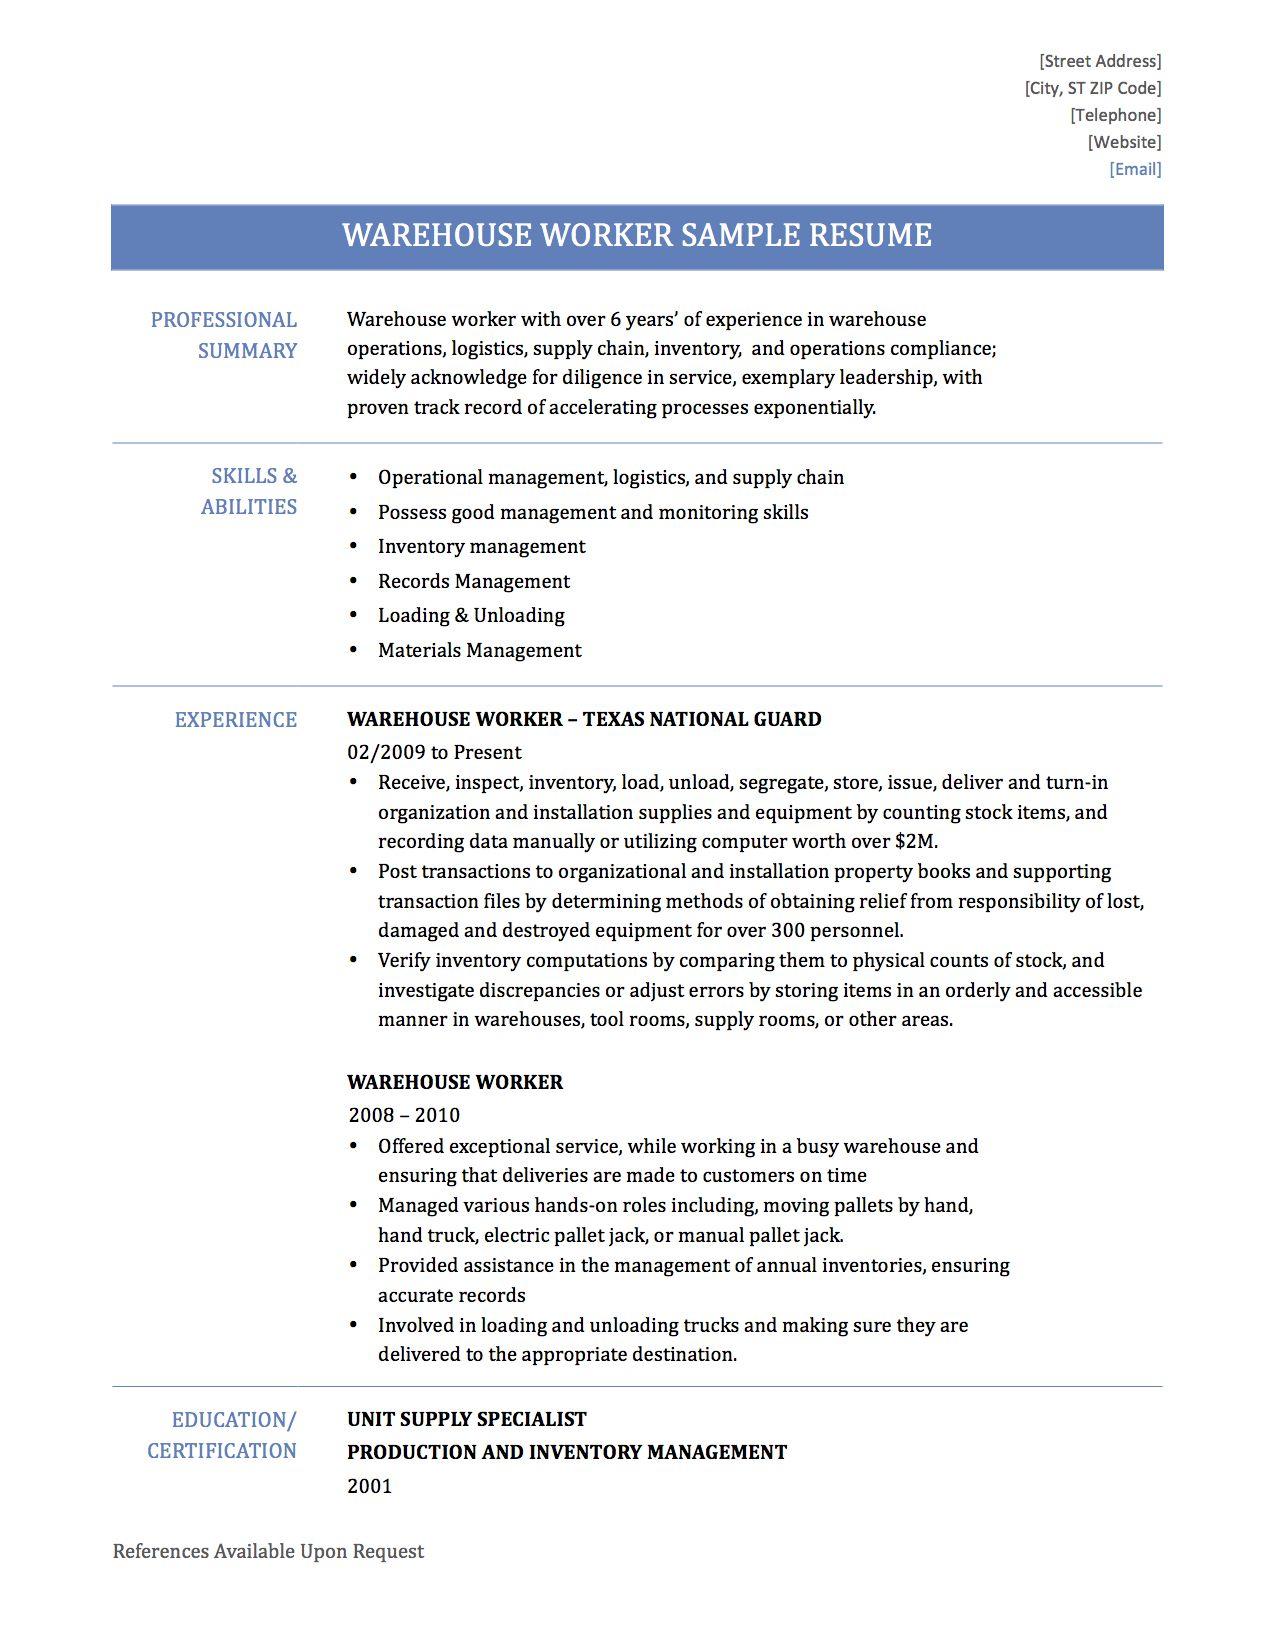 warehouse resume